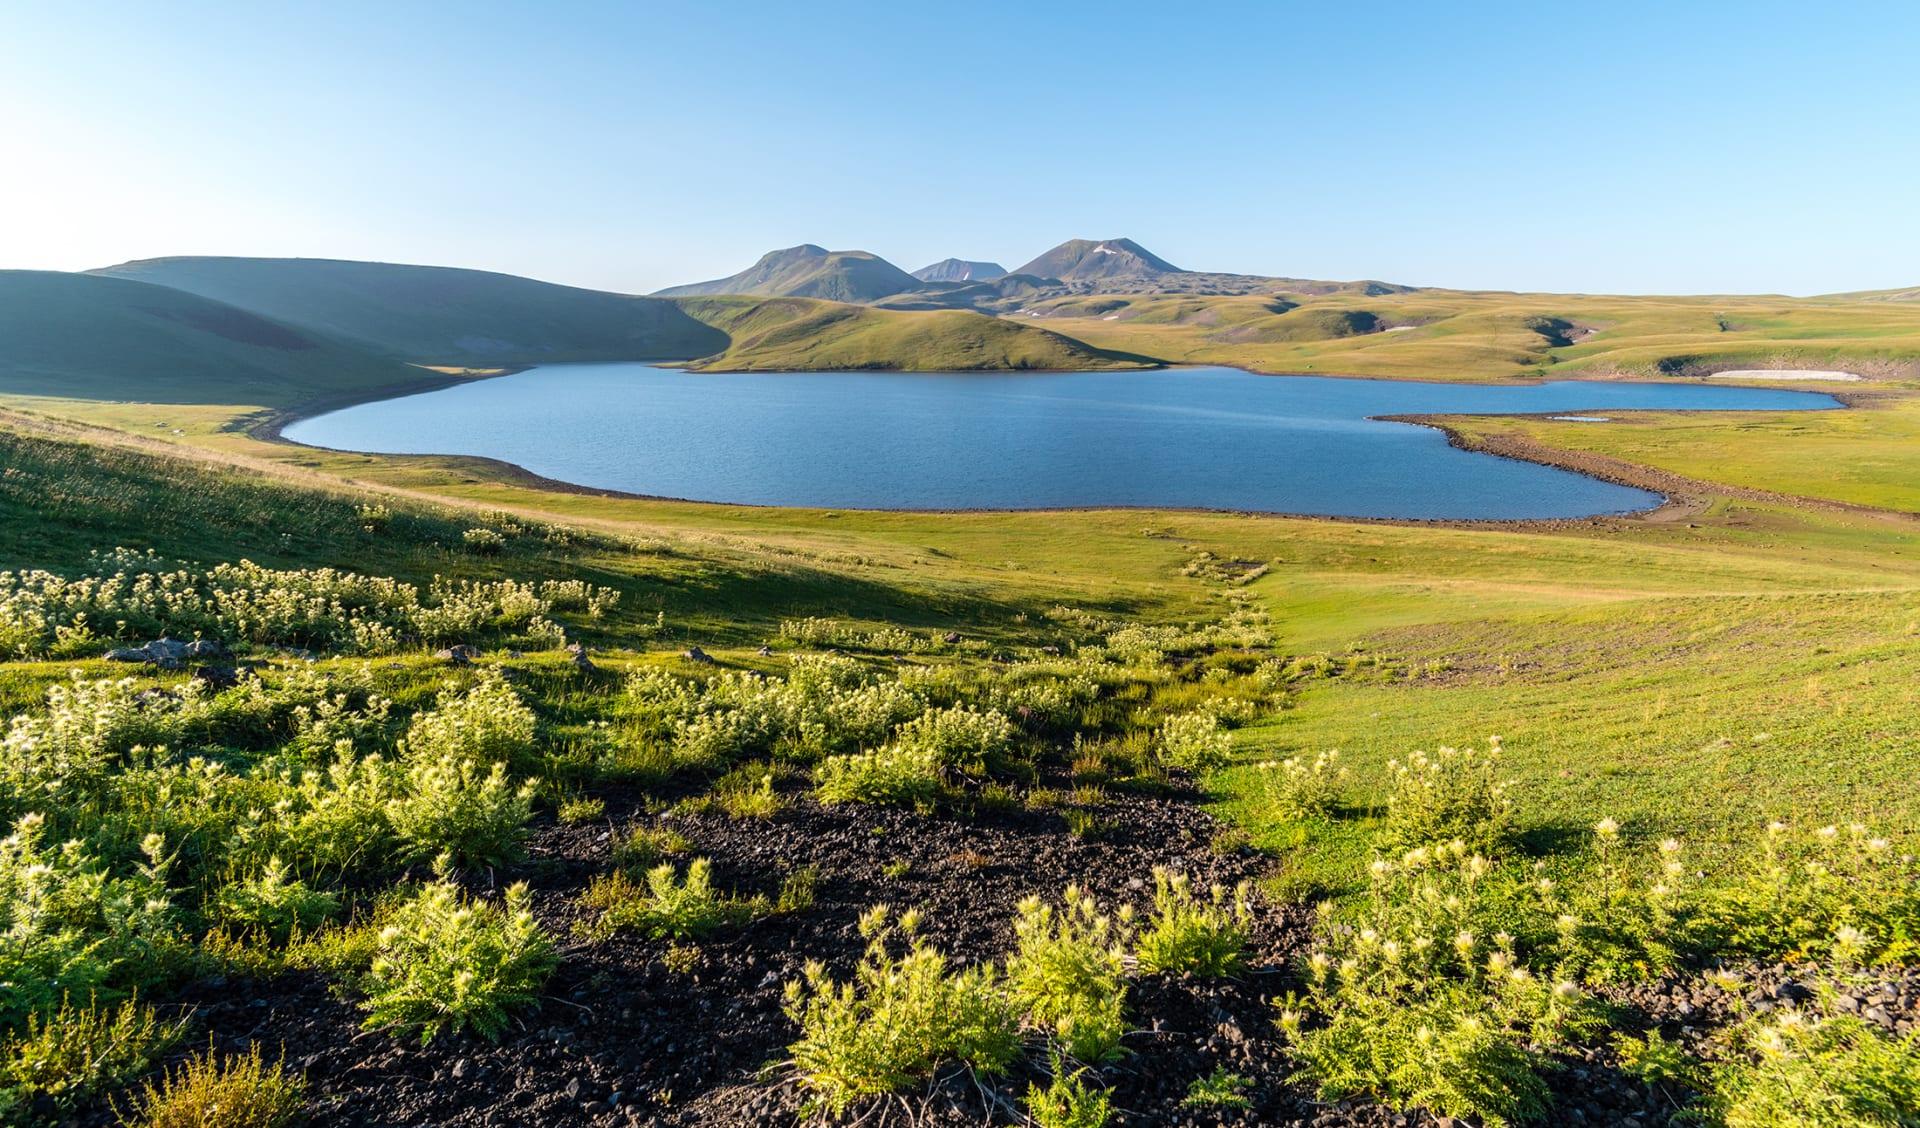 Trekkingreisen, Armenien, Zentralasien